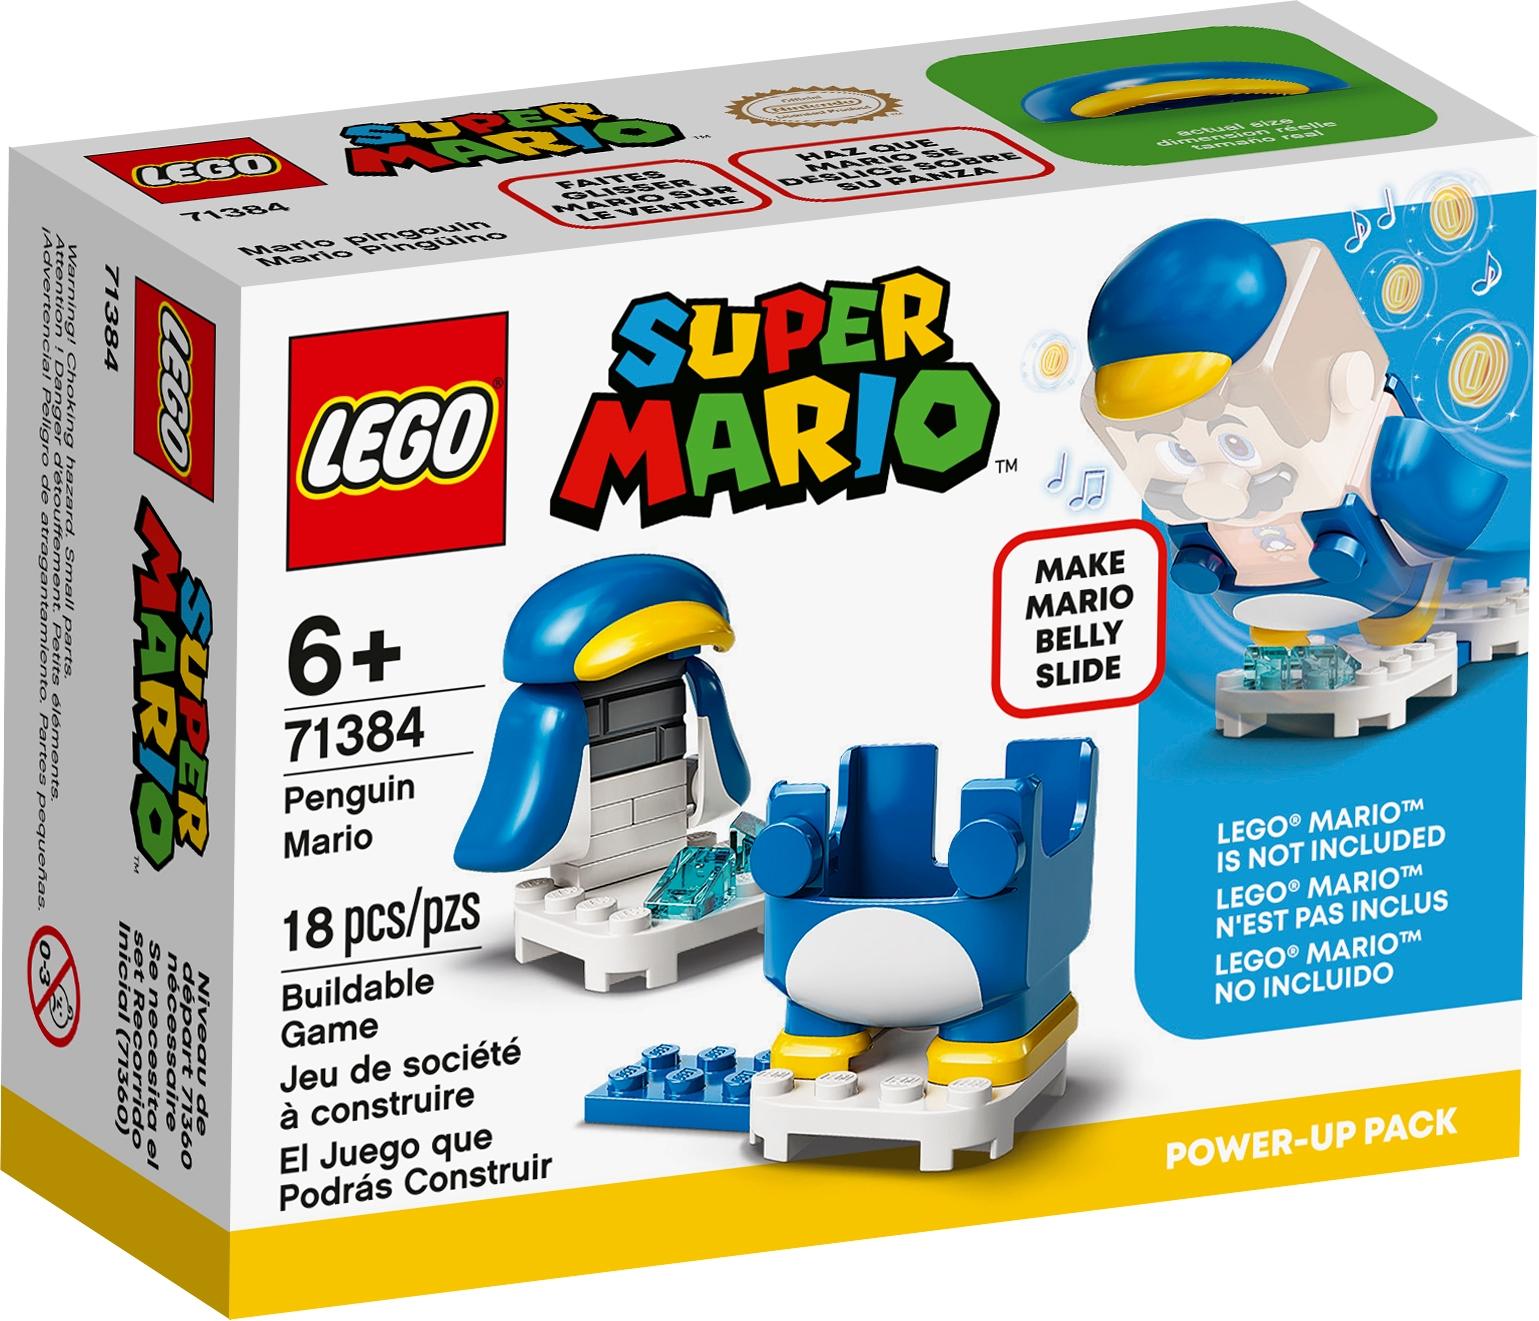 71384 Penguin Mario Power-Up Pack